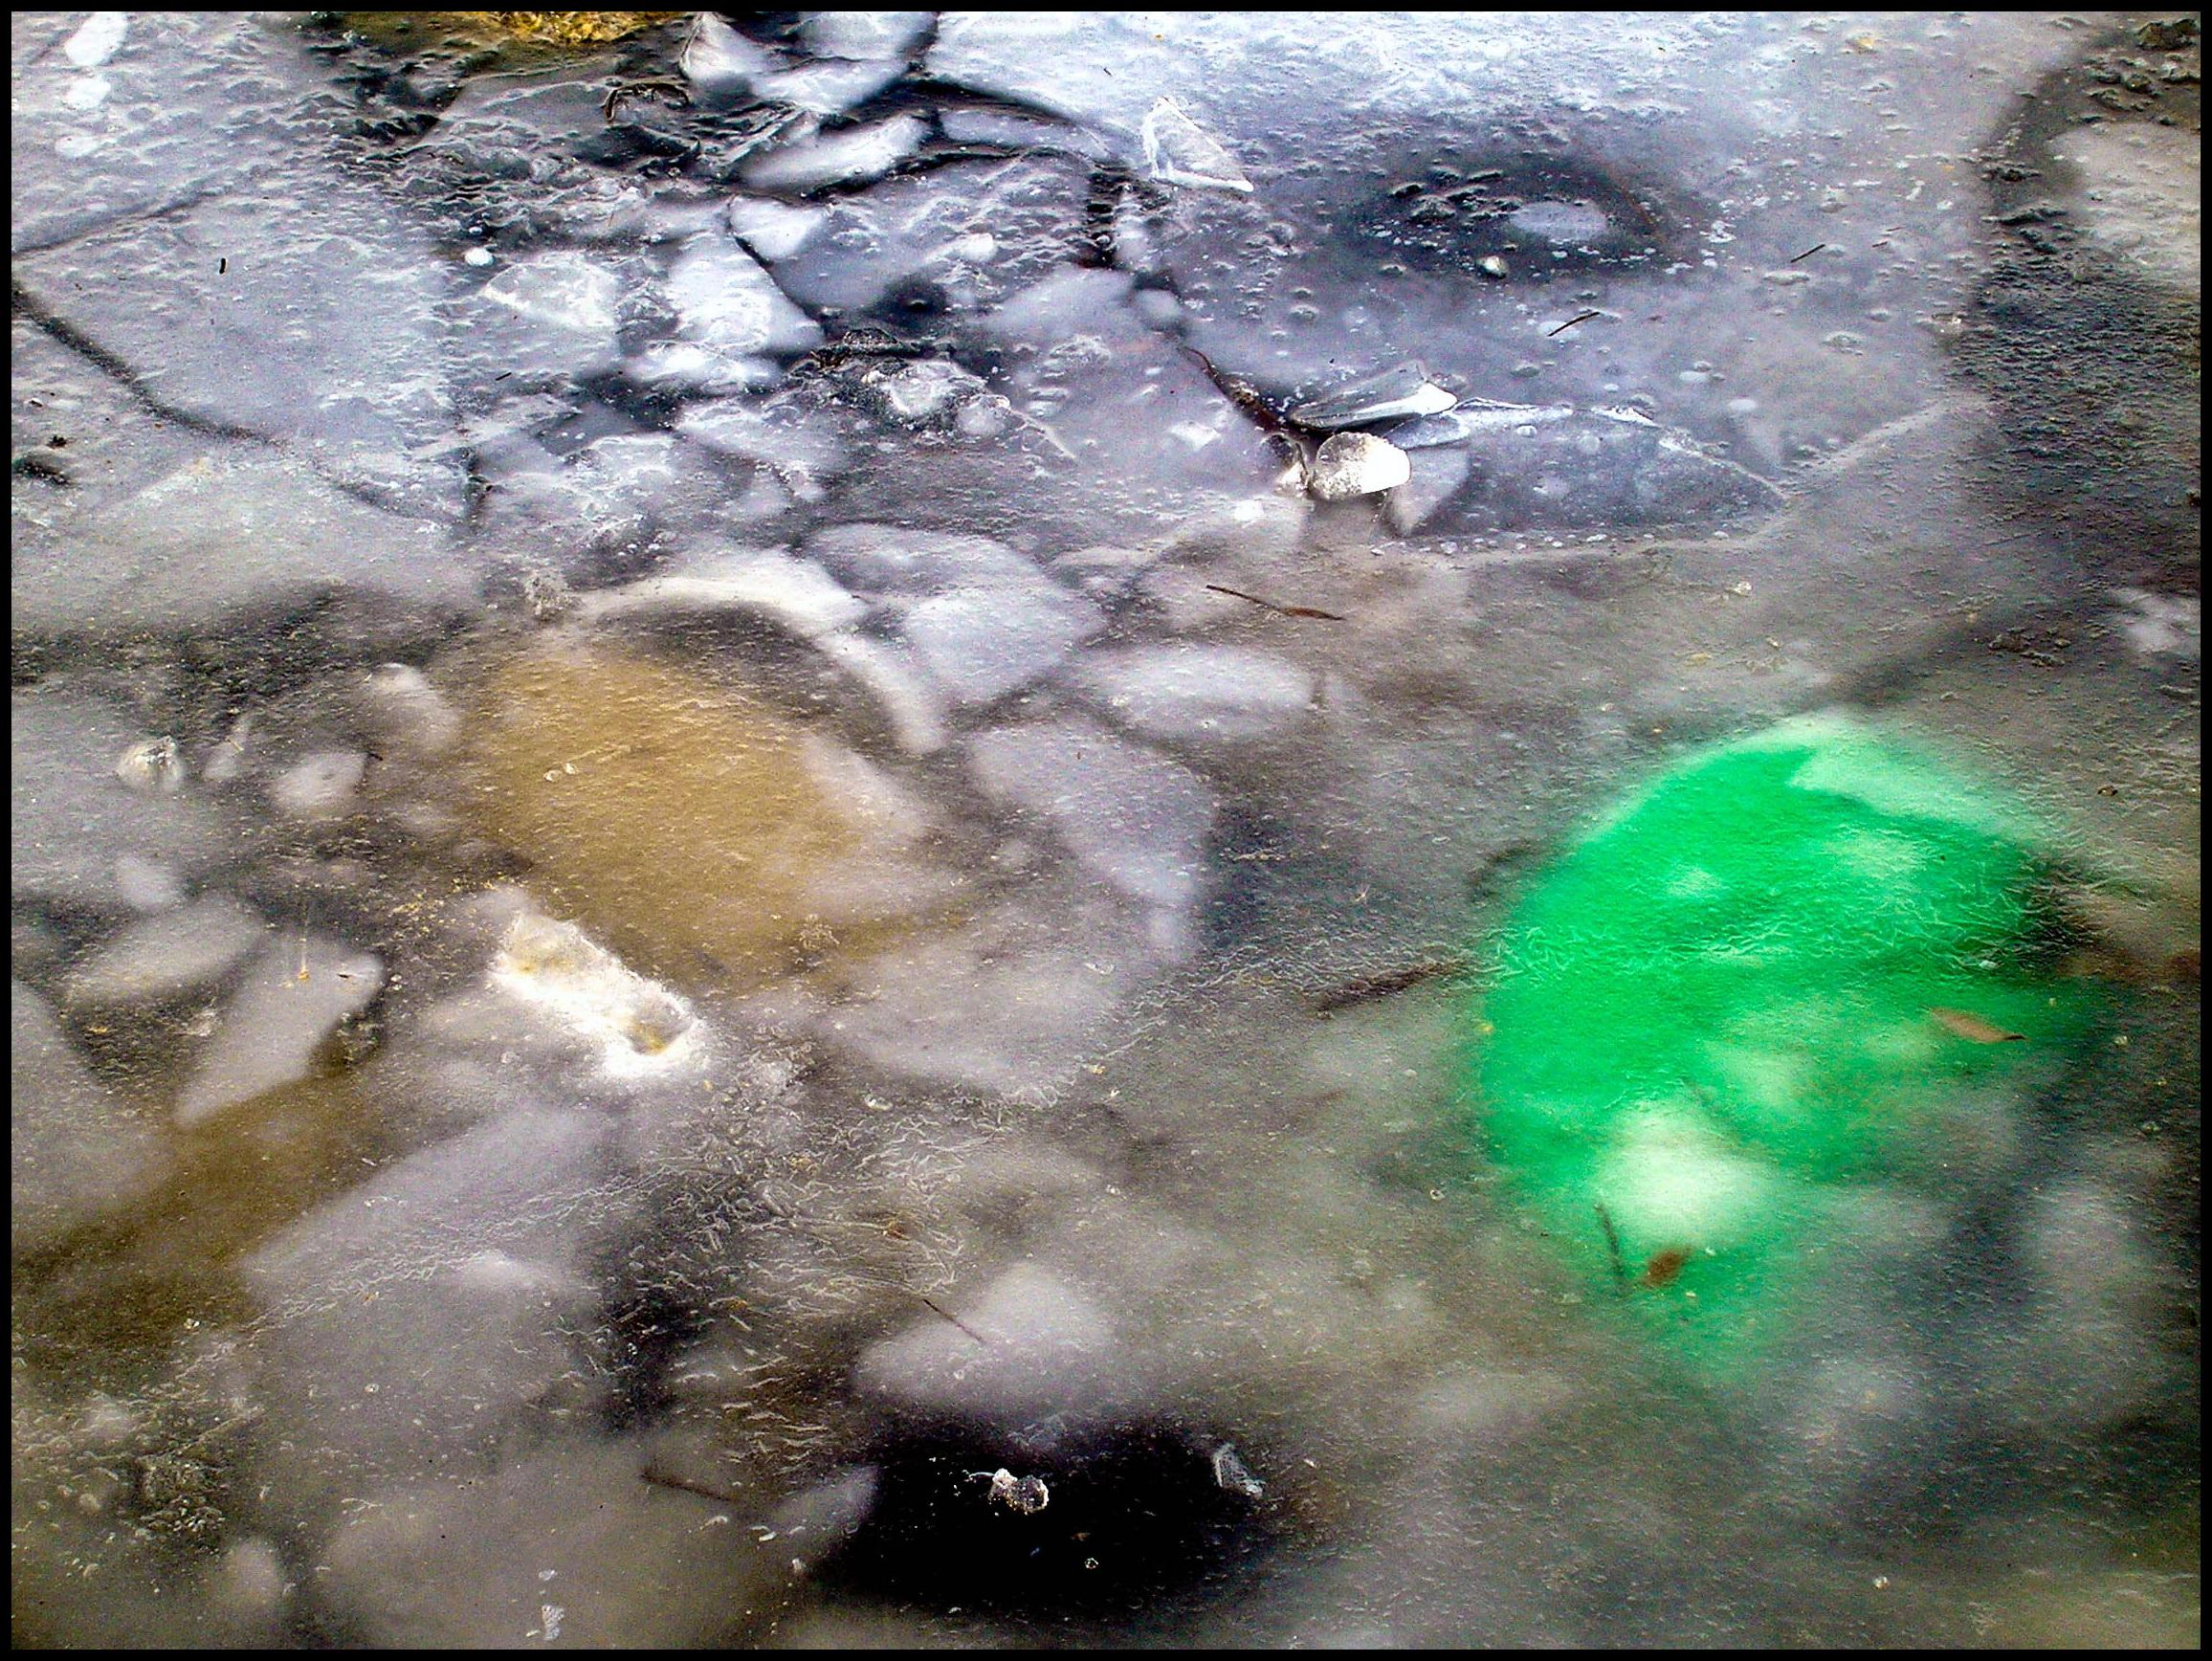 Mystery Green Orb Under Ice.jpg